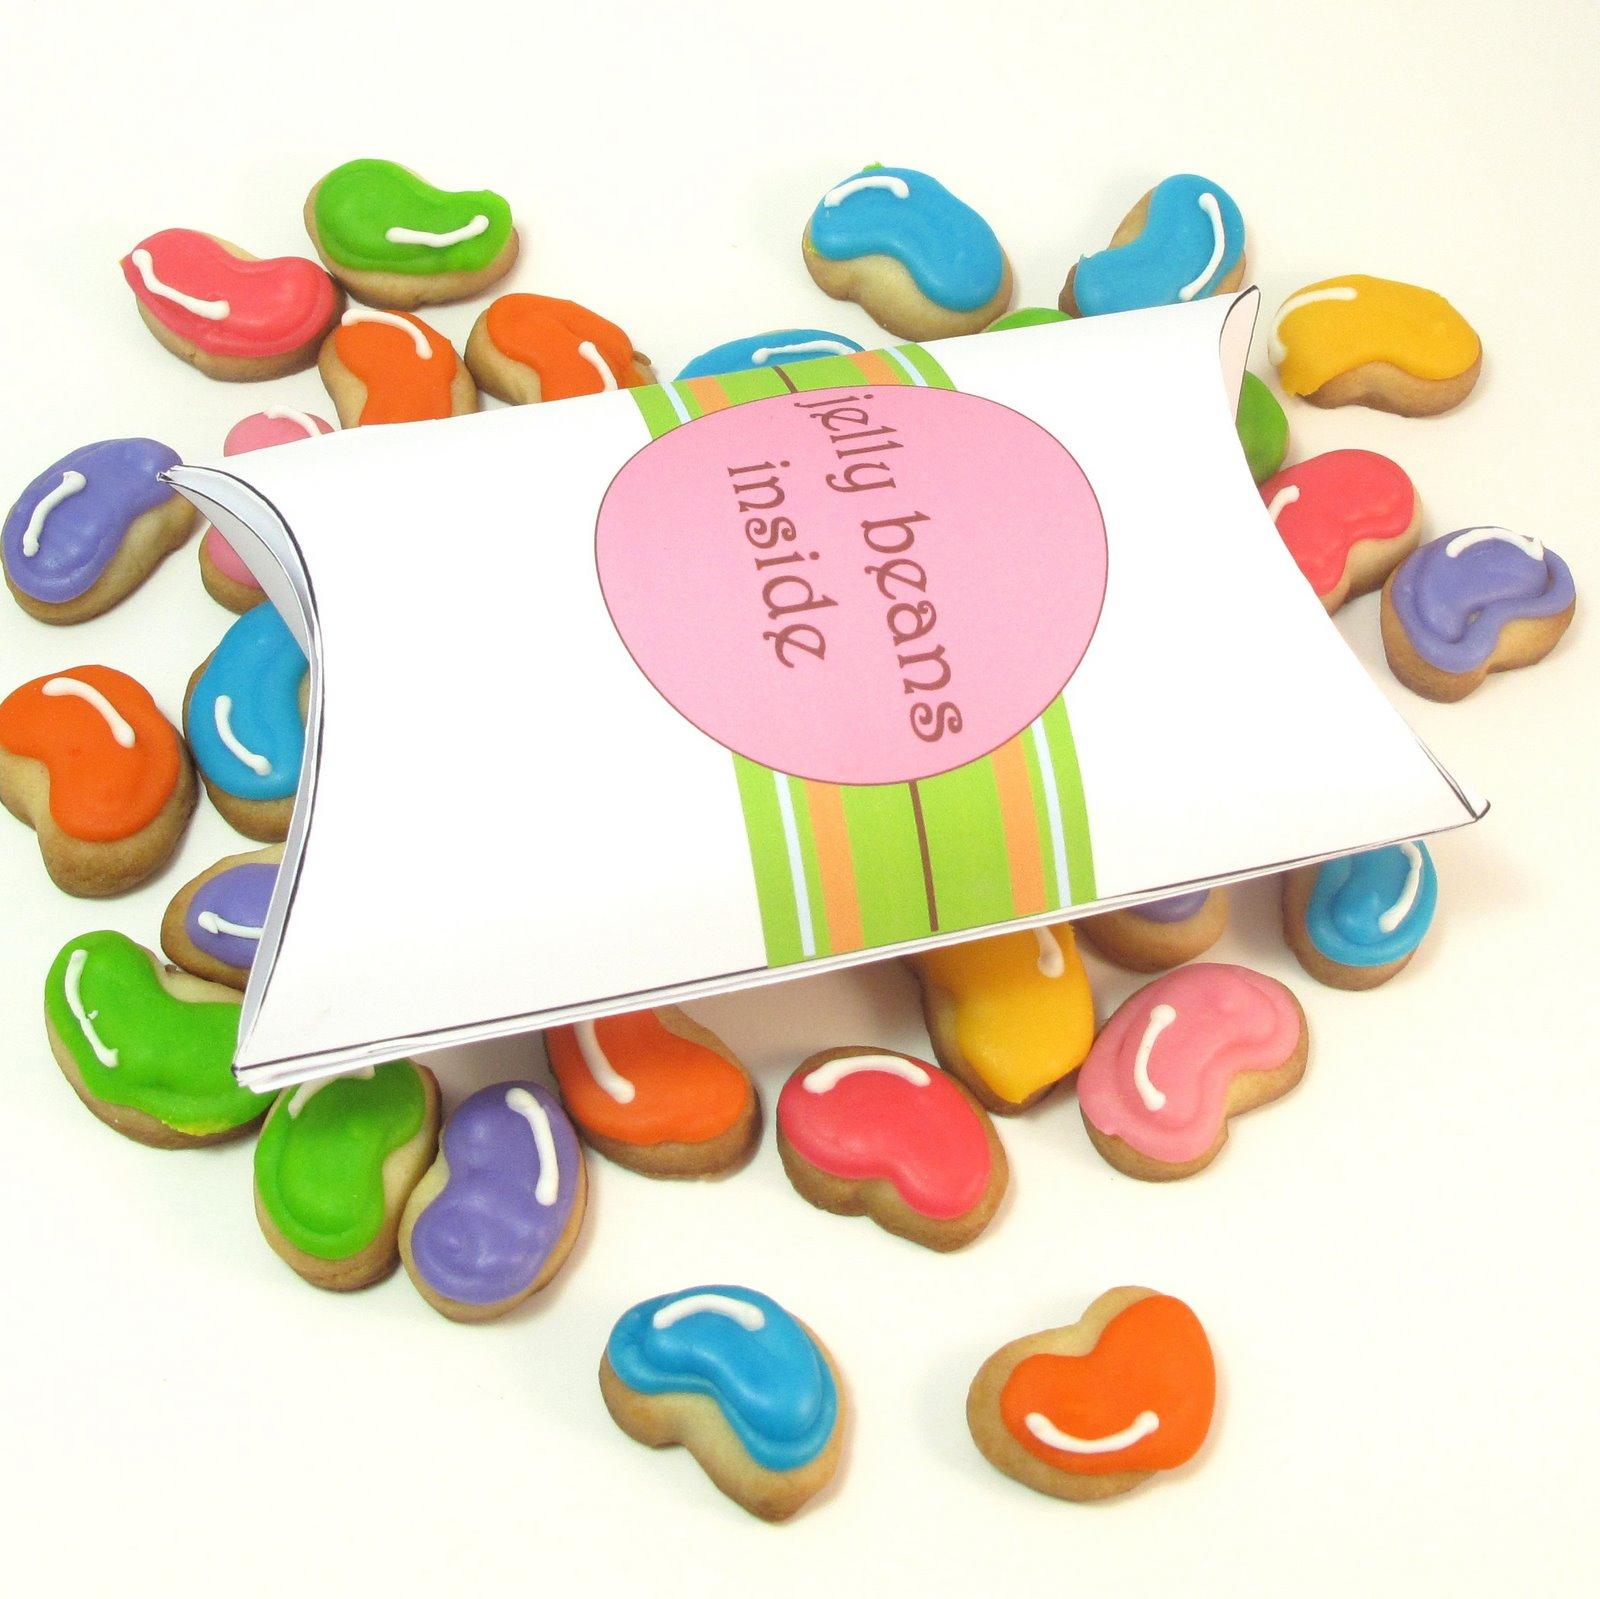 Maddycakes Muse Jelly Bean Bonanza